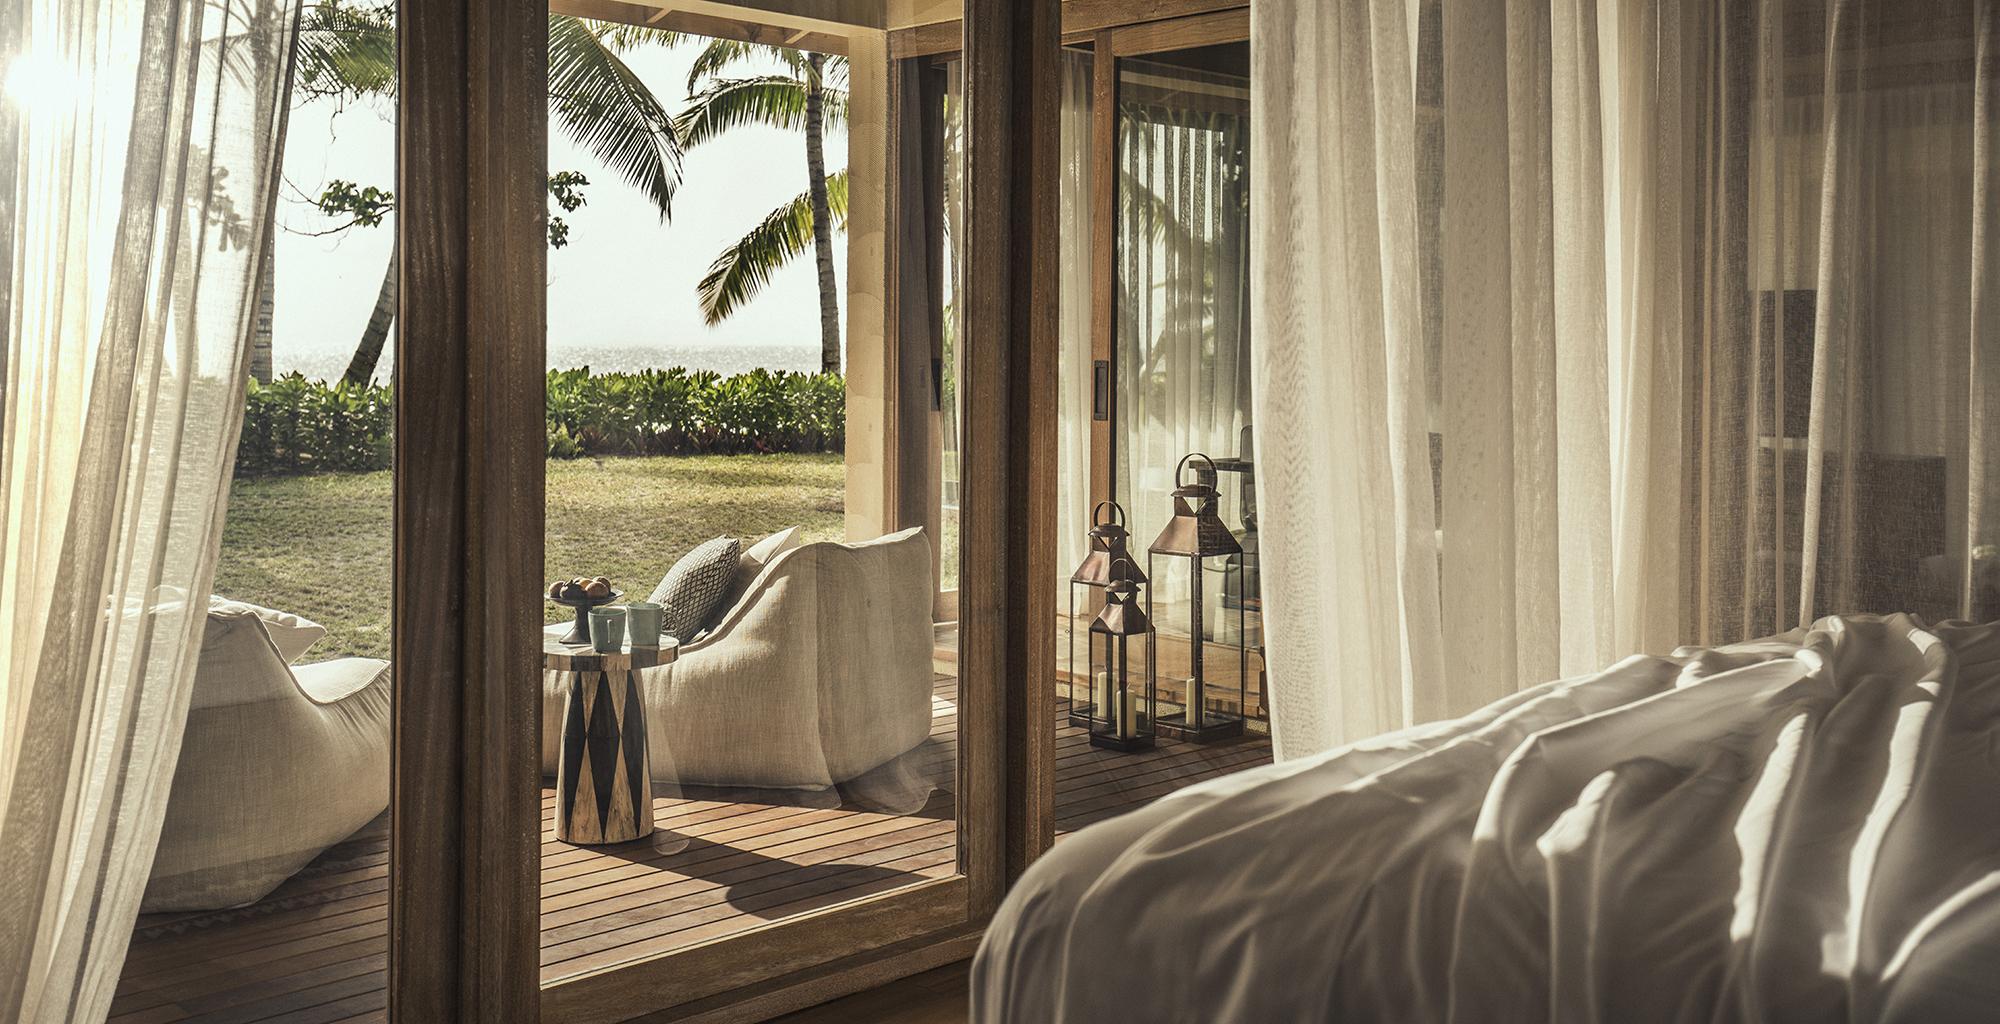 Seychelles-Desroches-Island-Resort-Bedroom-Deck